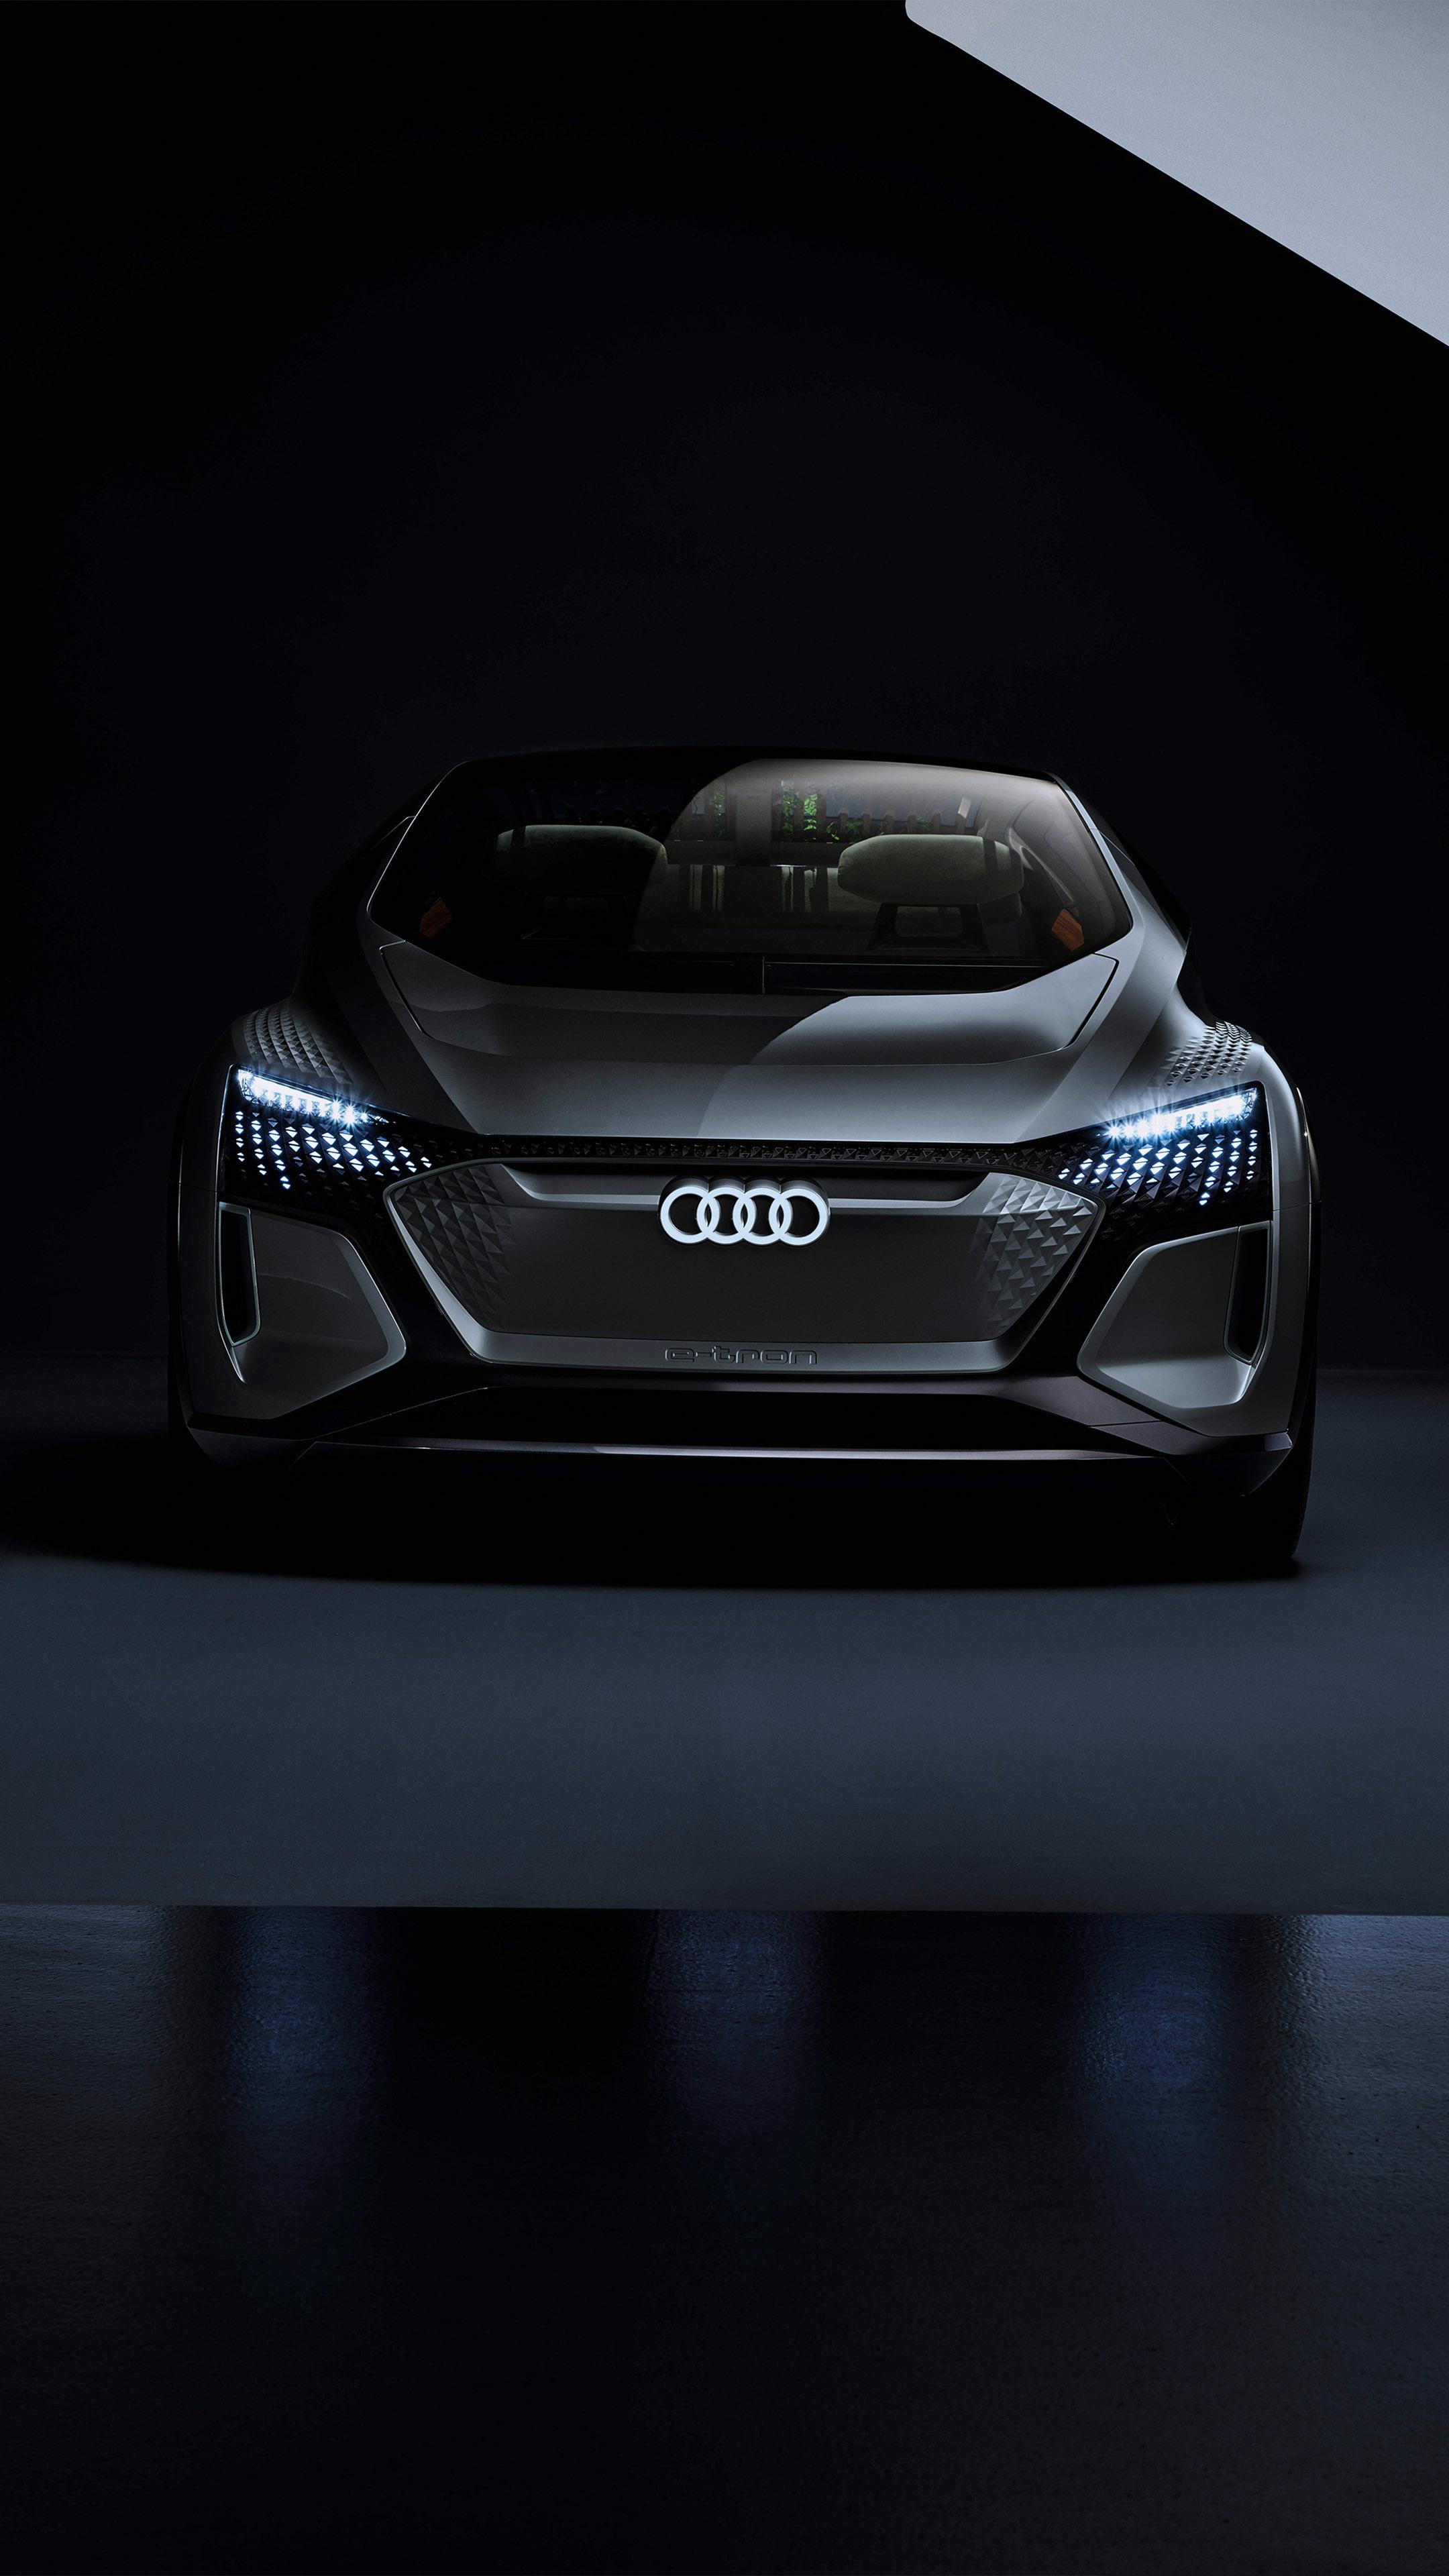 Audi Ai:Me Concept Cars 2019 4K Ultra ...